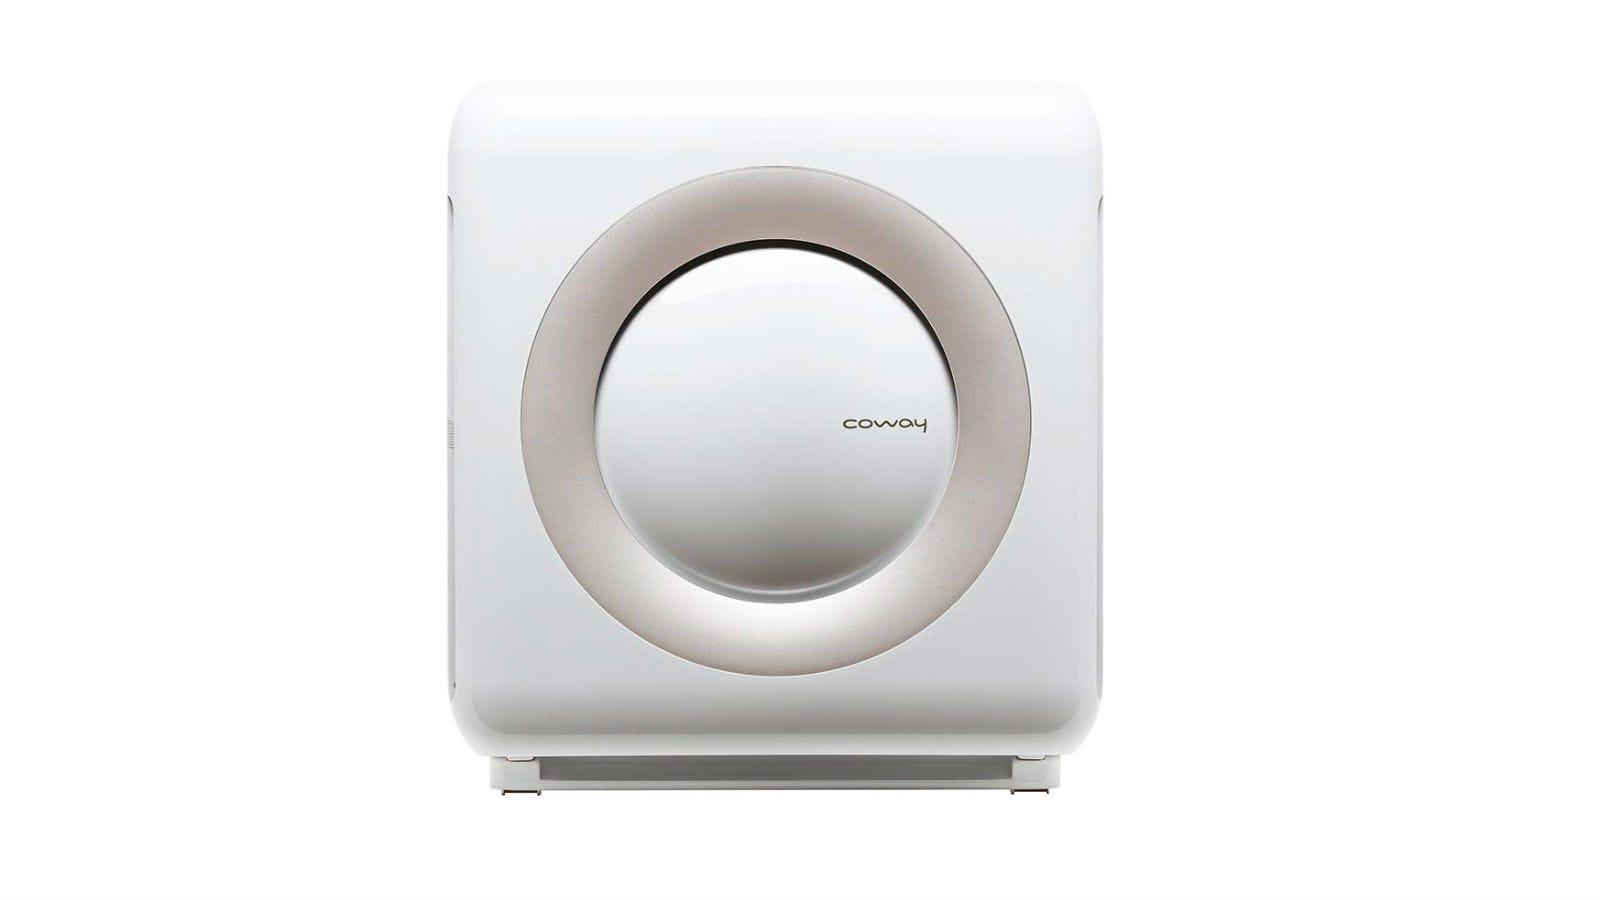 conway air purifier